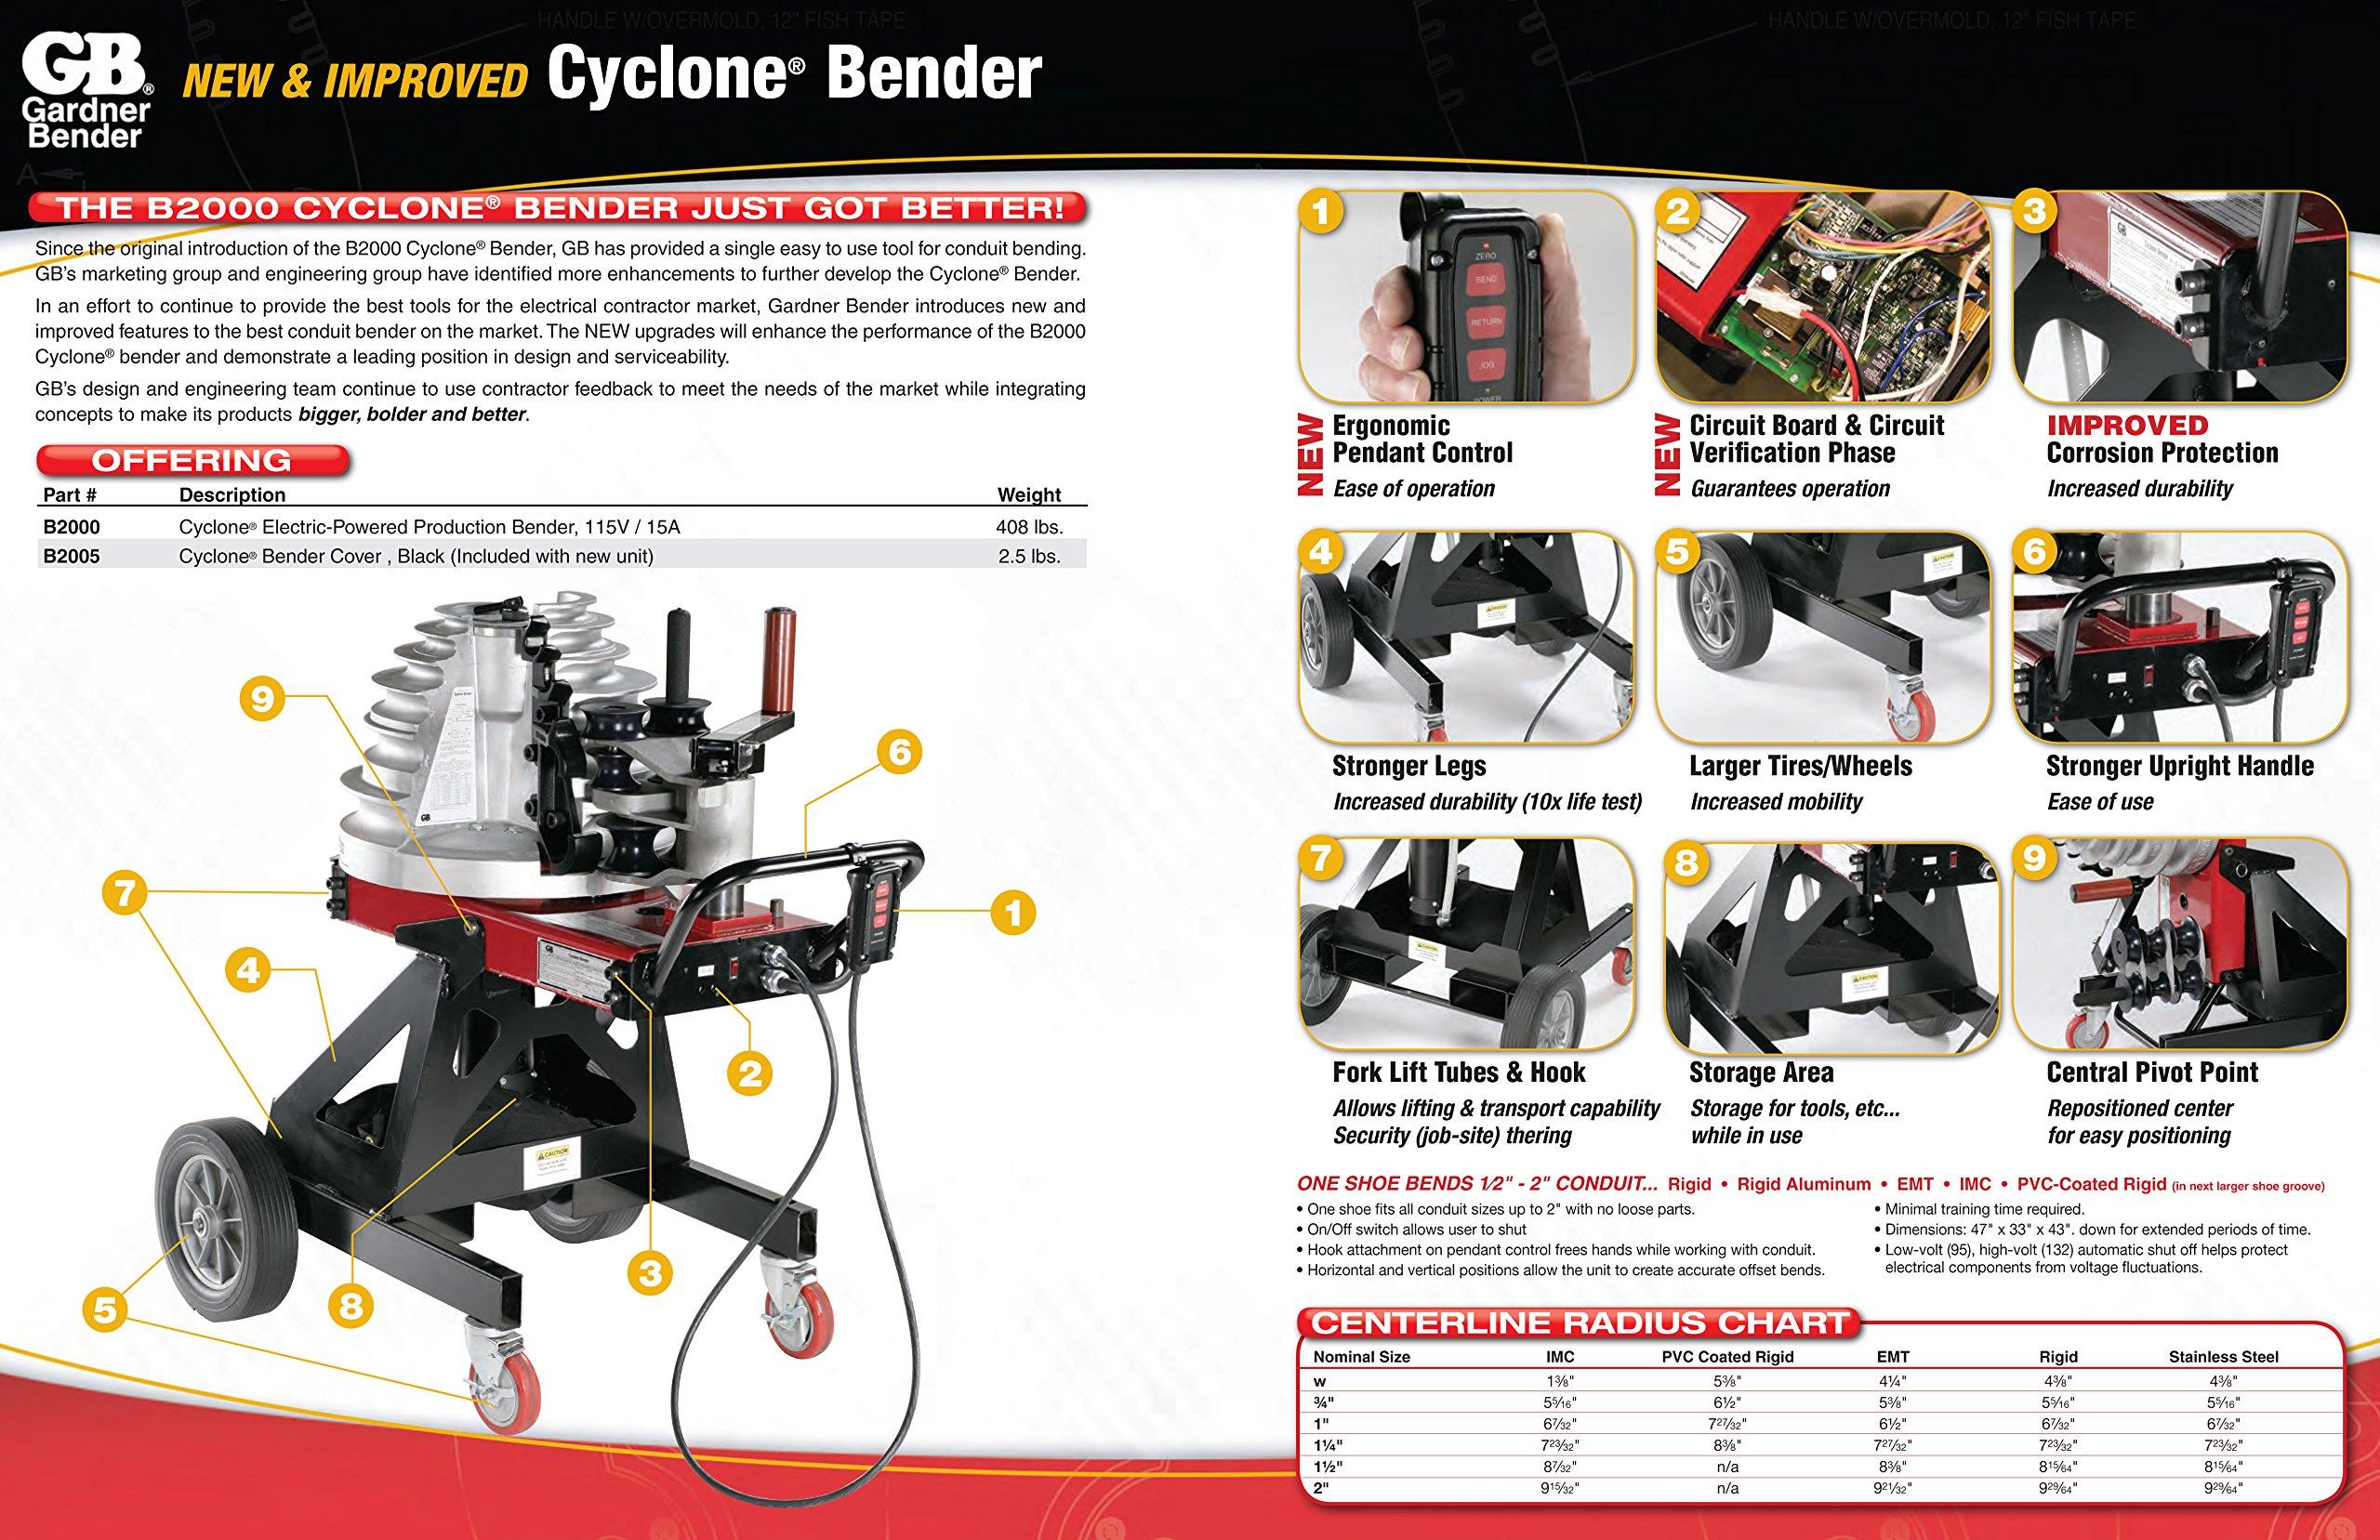 Gardner Bender B2000 Cyclone Electric Powered Bender, ½ - 2 in. EMT, Rigid, Rigid Aluminum & IMC Conduit, & ½ - 1½ in. PVC-Coated Conduit, No Shoe Group, Red & Black by Gardner Bender (Image #7)